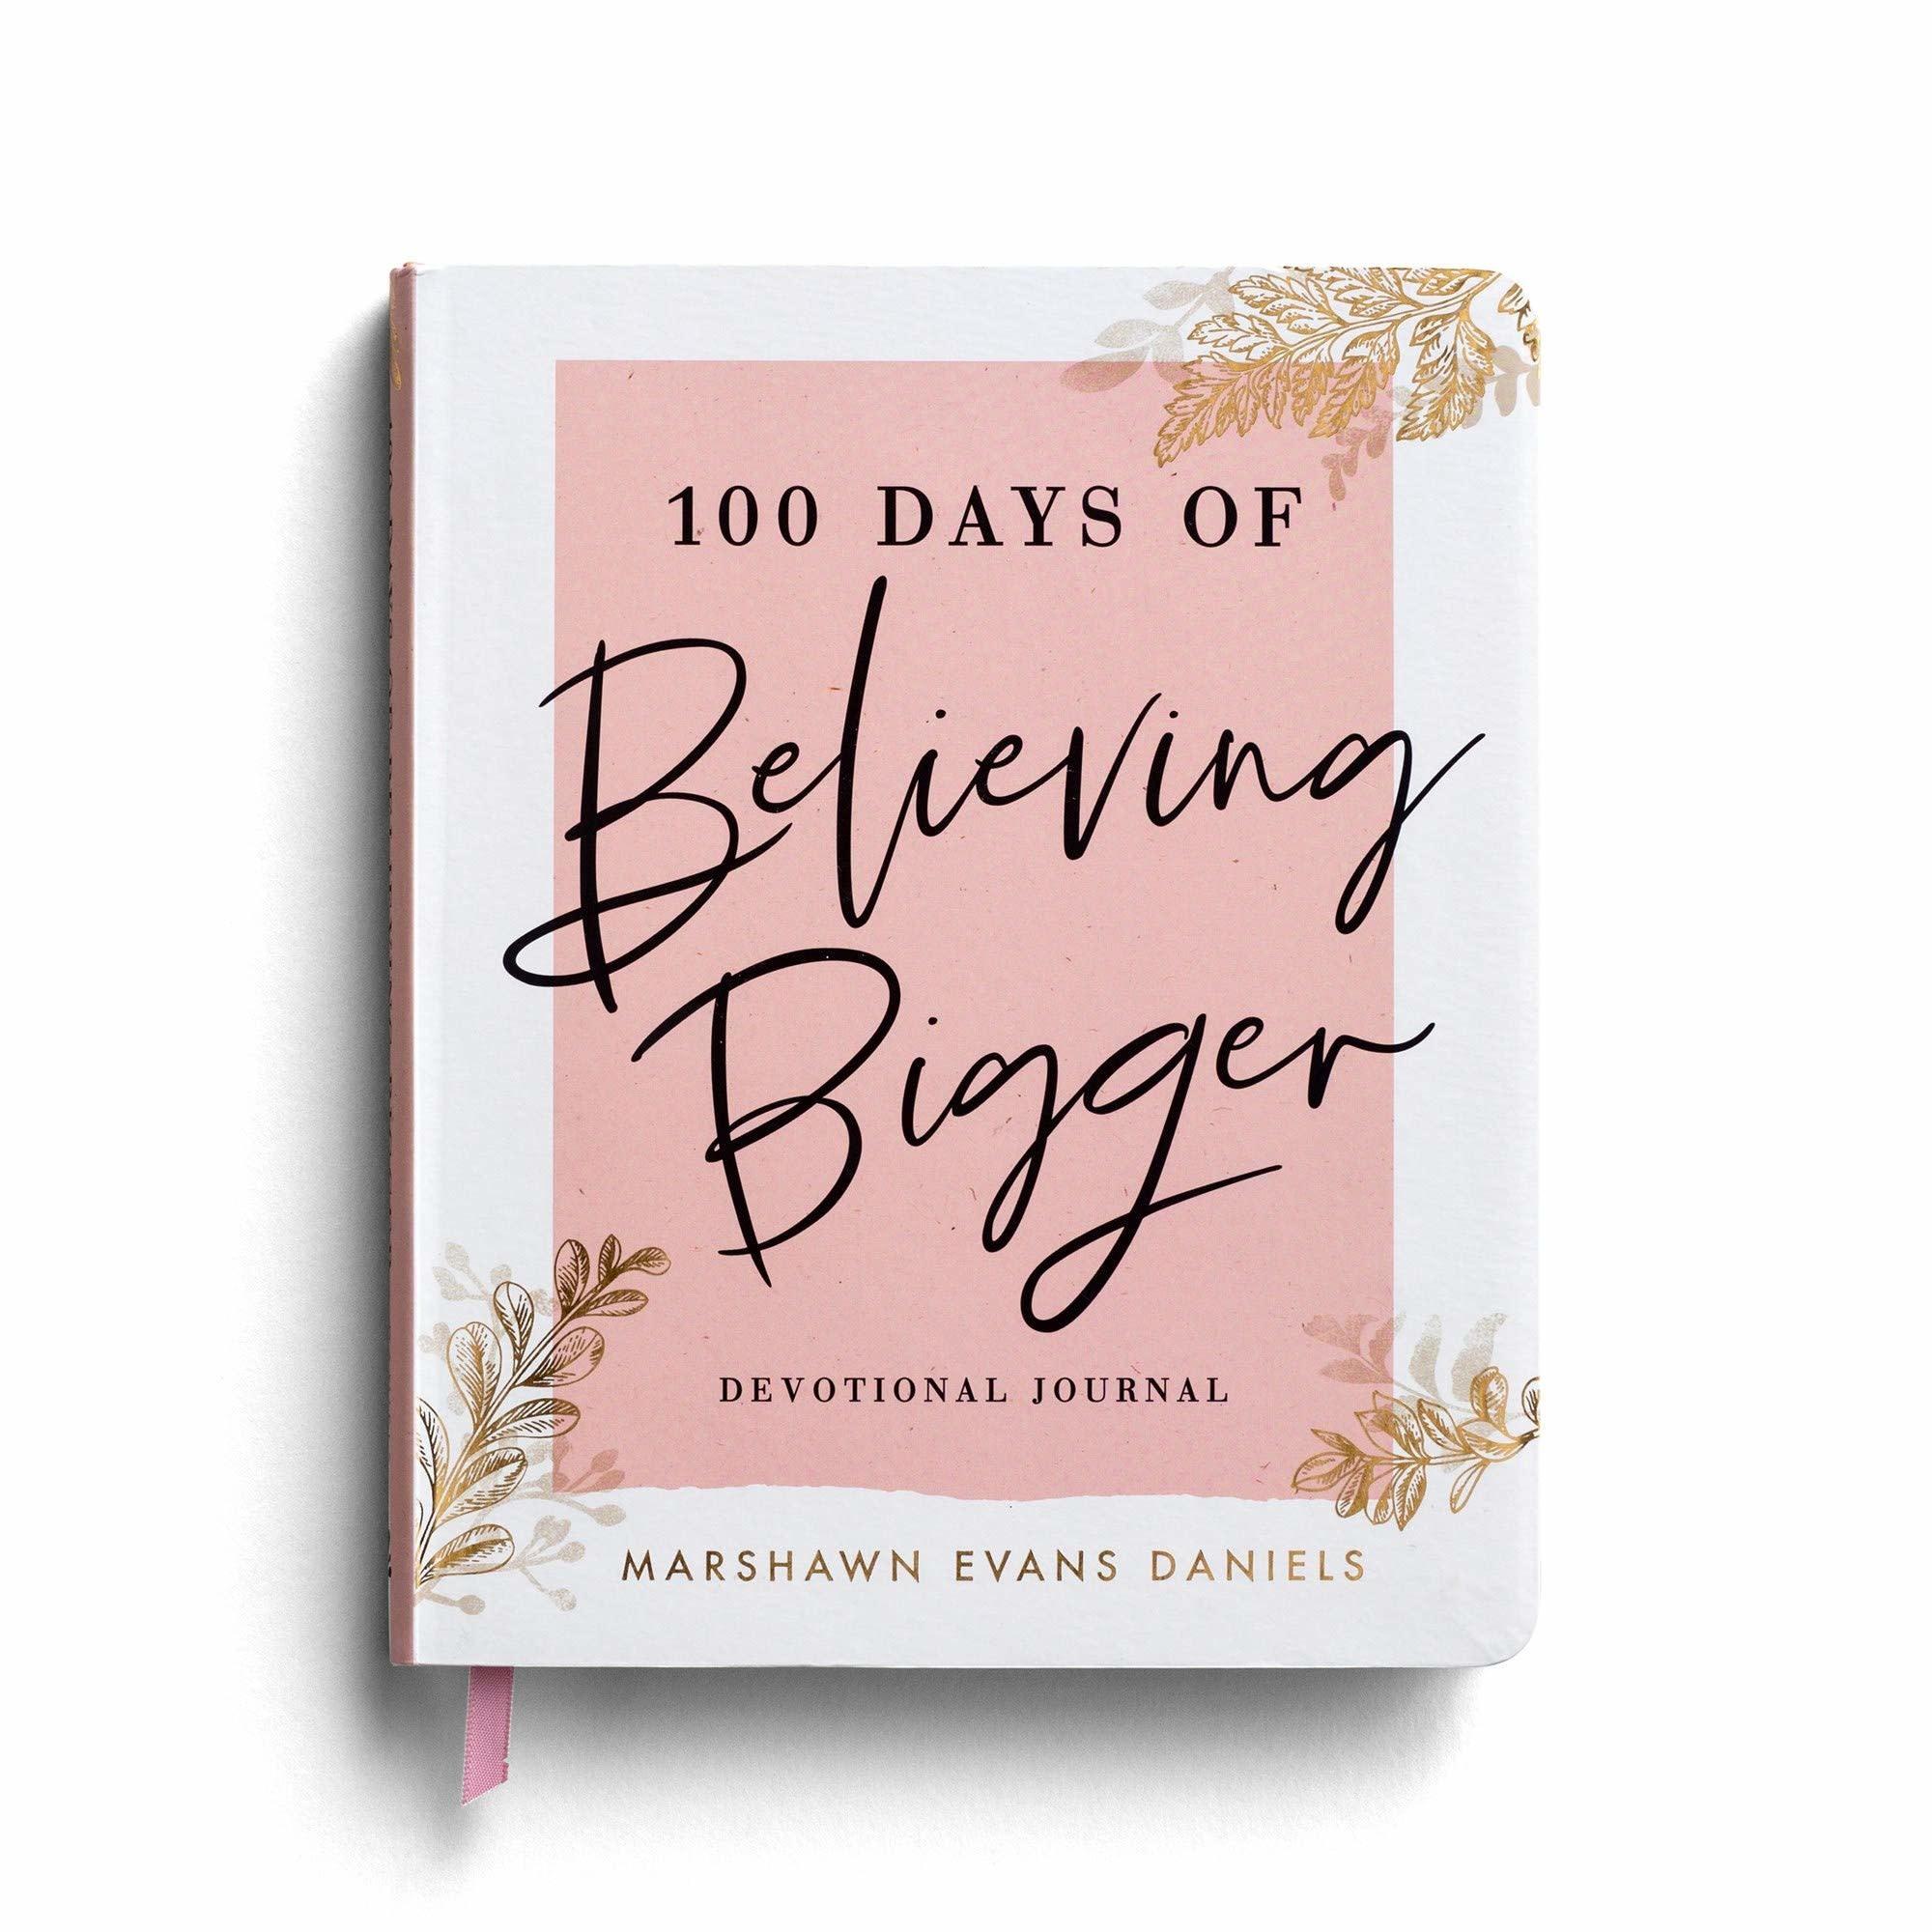 100 Days of Believing Bigger